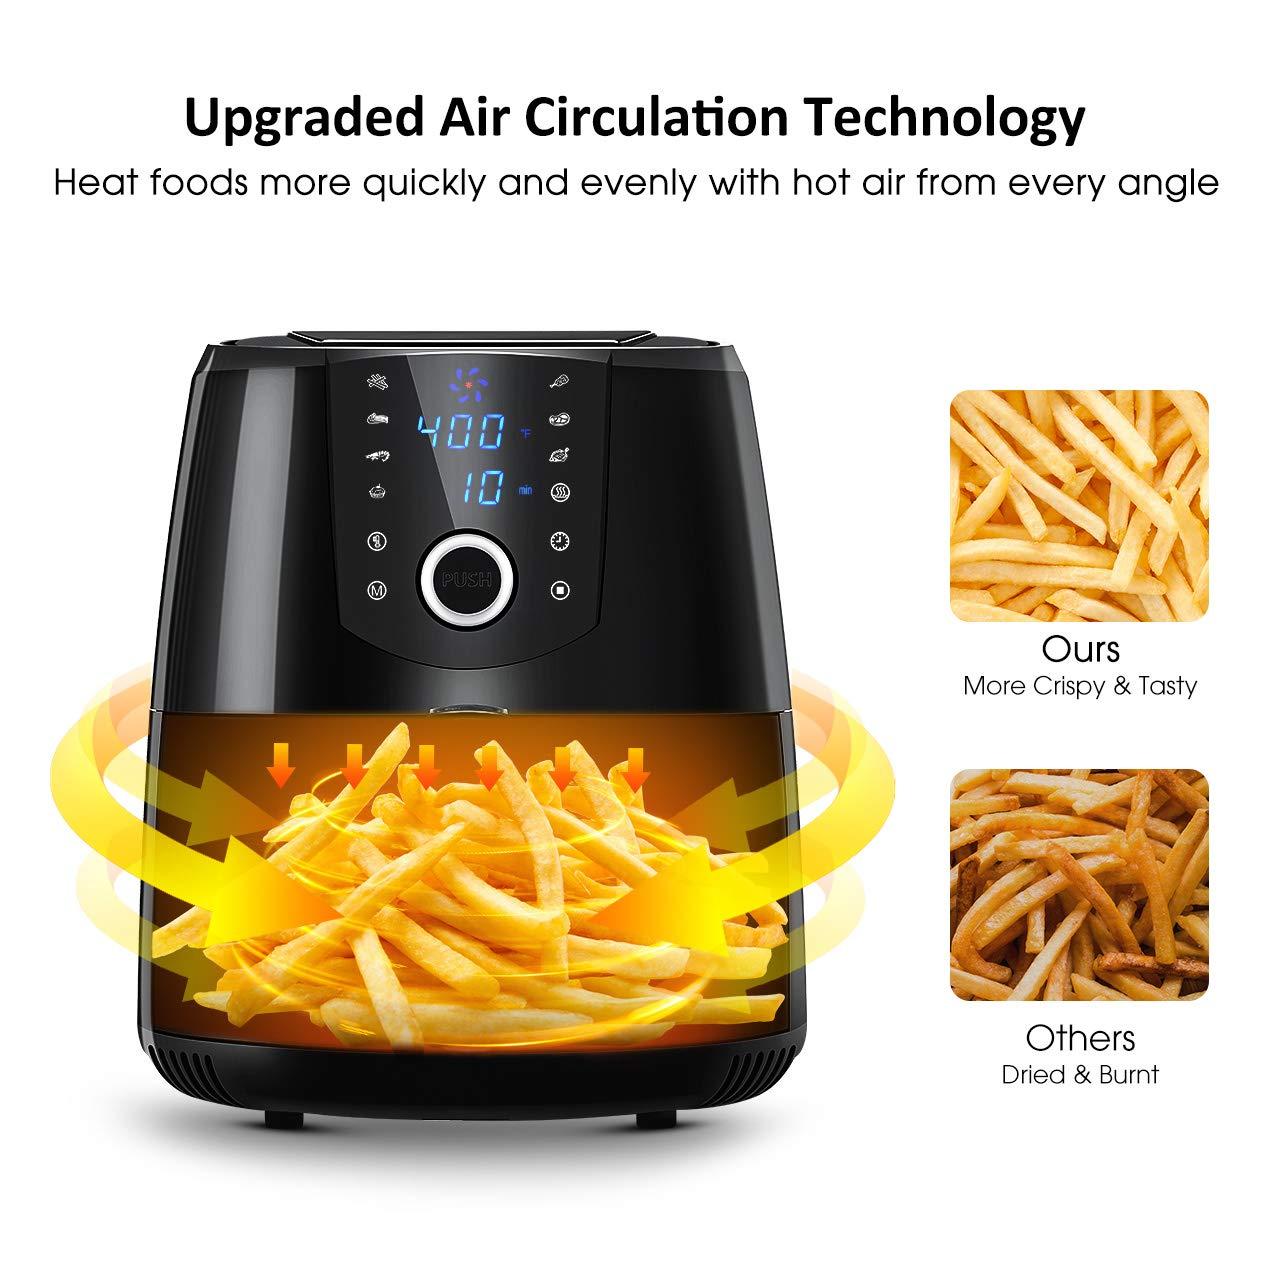 Amazon.com: OMORC - Freidora de aire, 3,8 litros (libro de ...